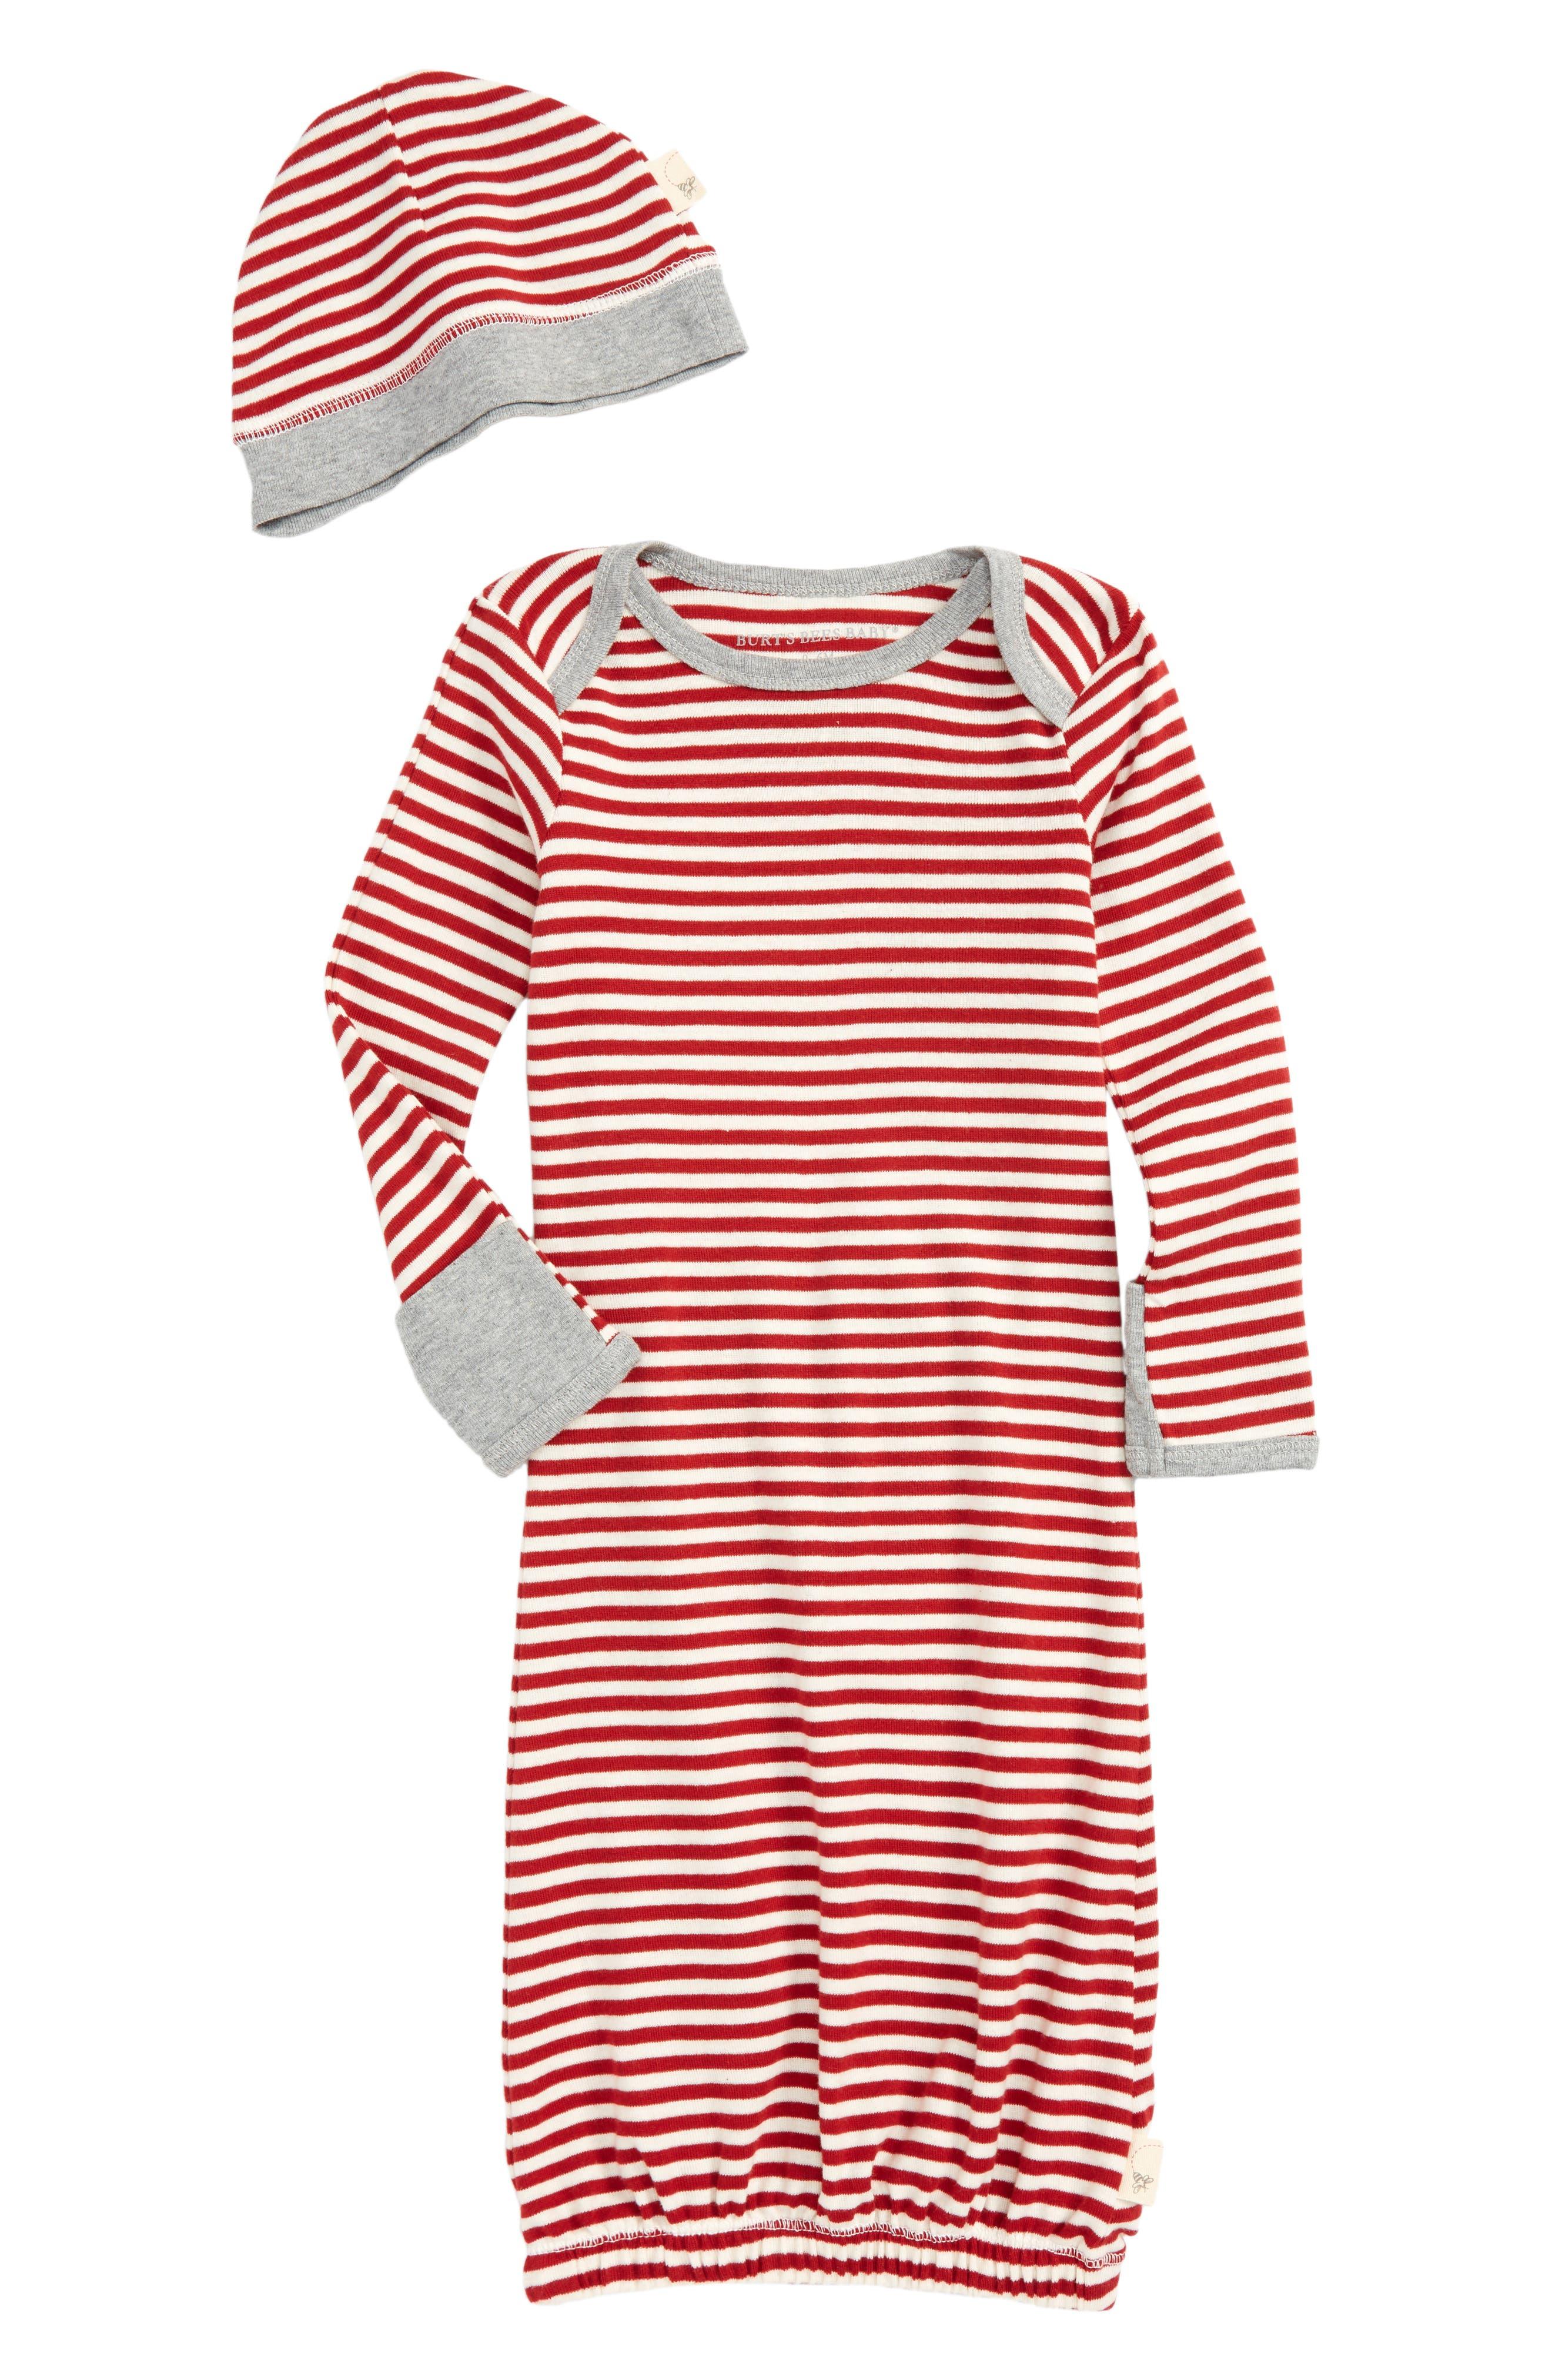 Burt's Bees Baby Stripe Organic Cotton Gown & Cap Set (Baby)